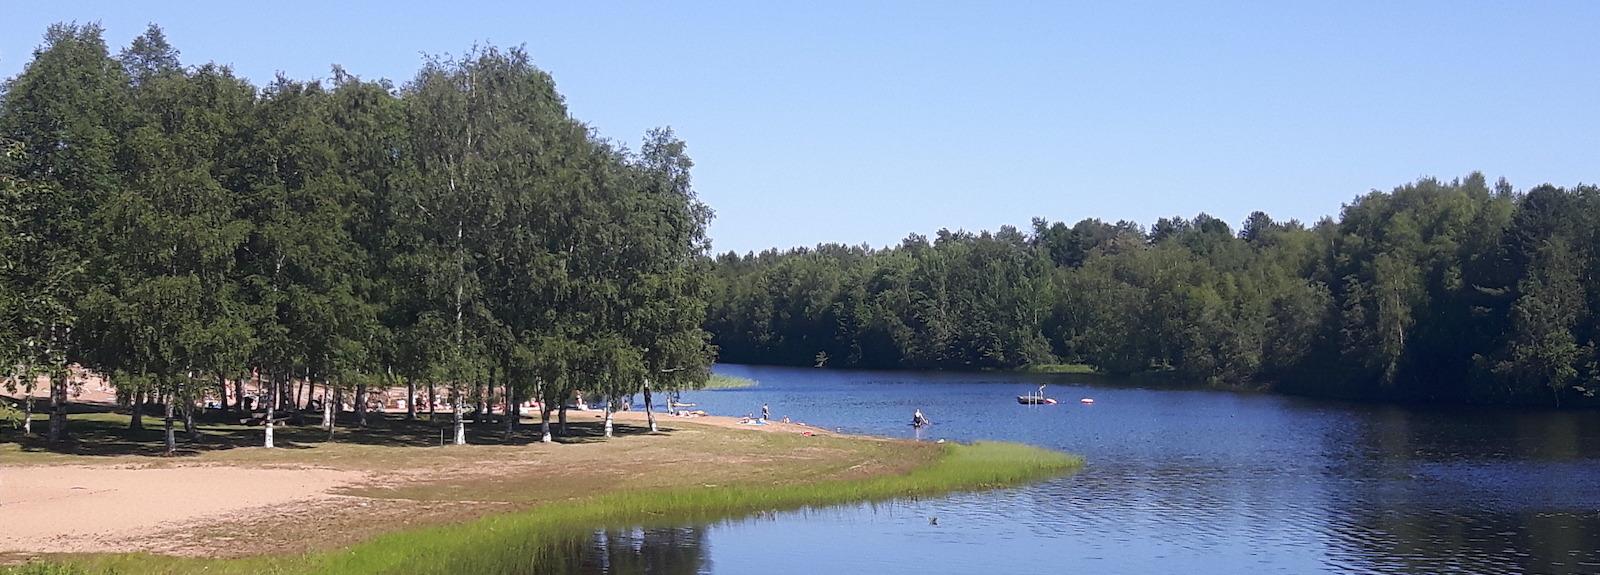 People Swimming on Warm day near Oulu Finland